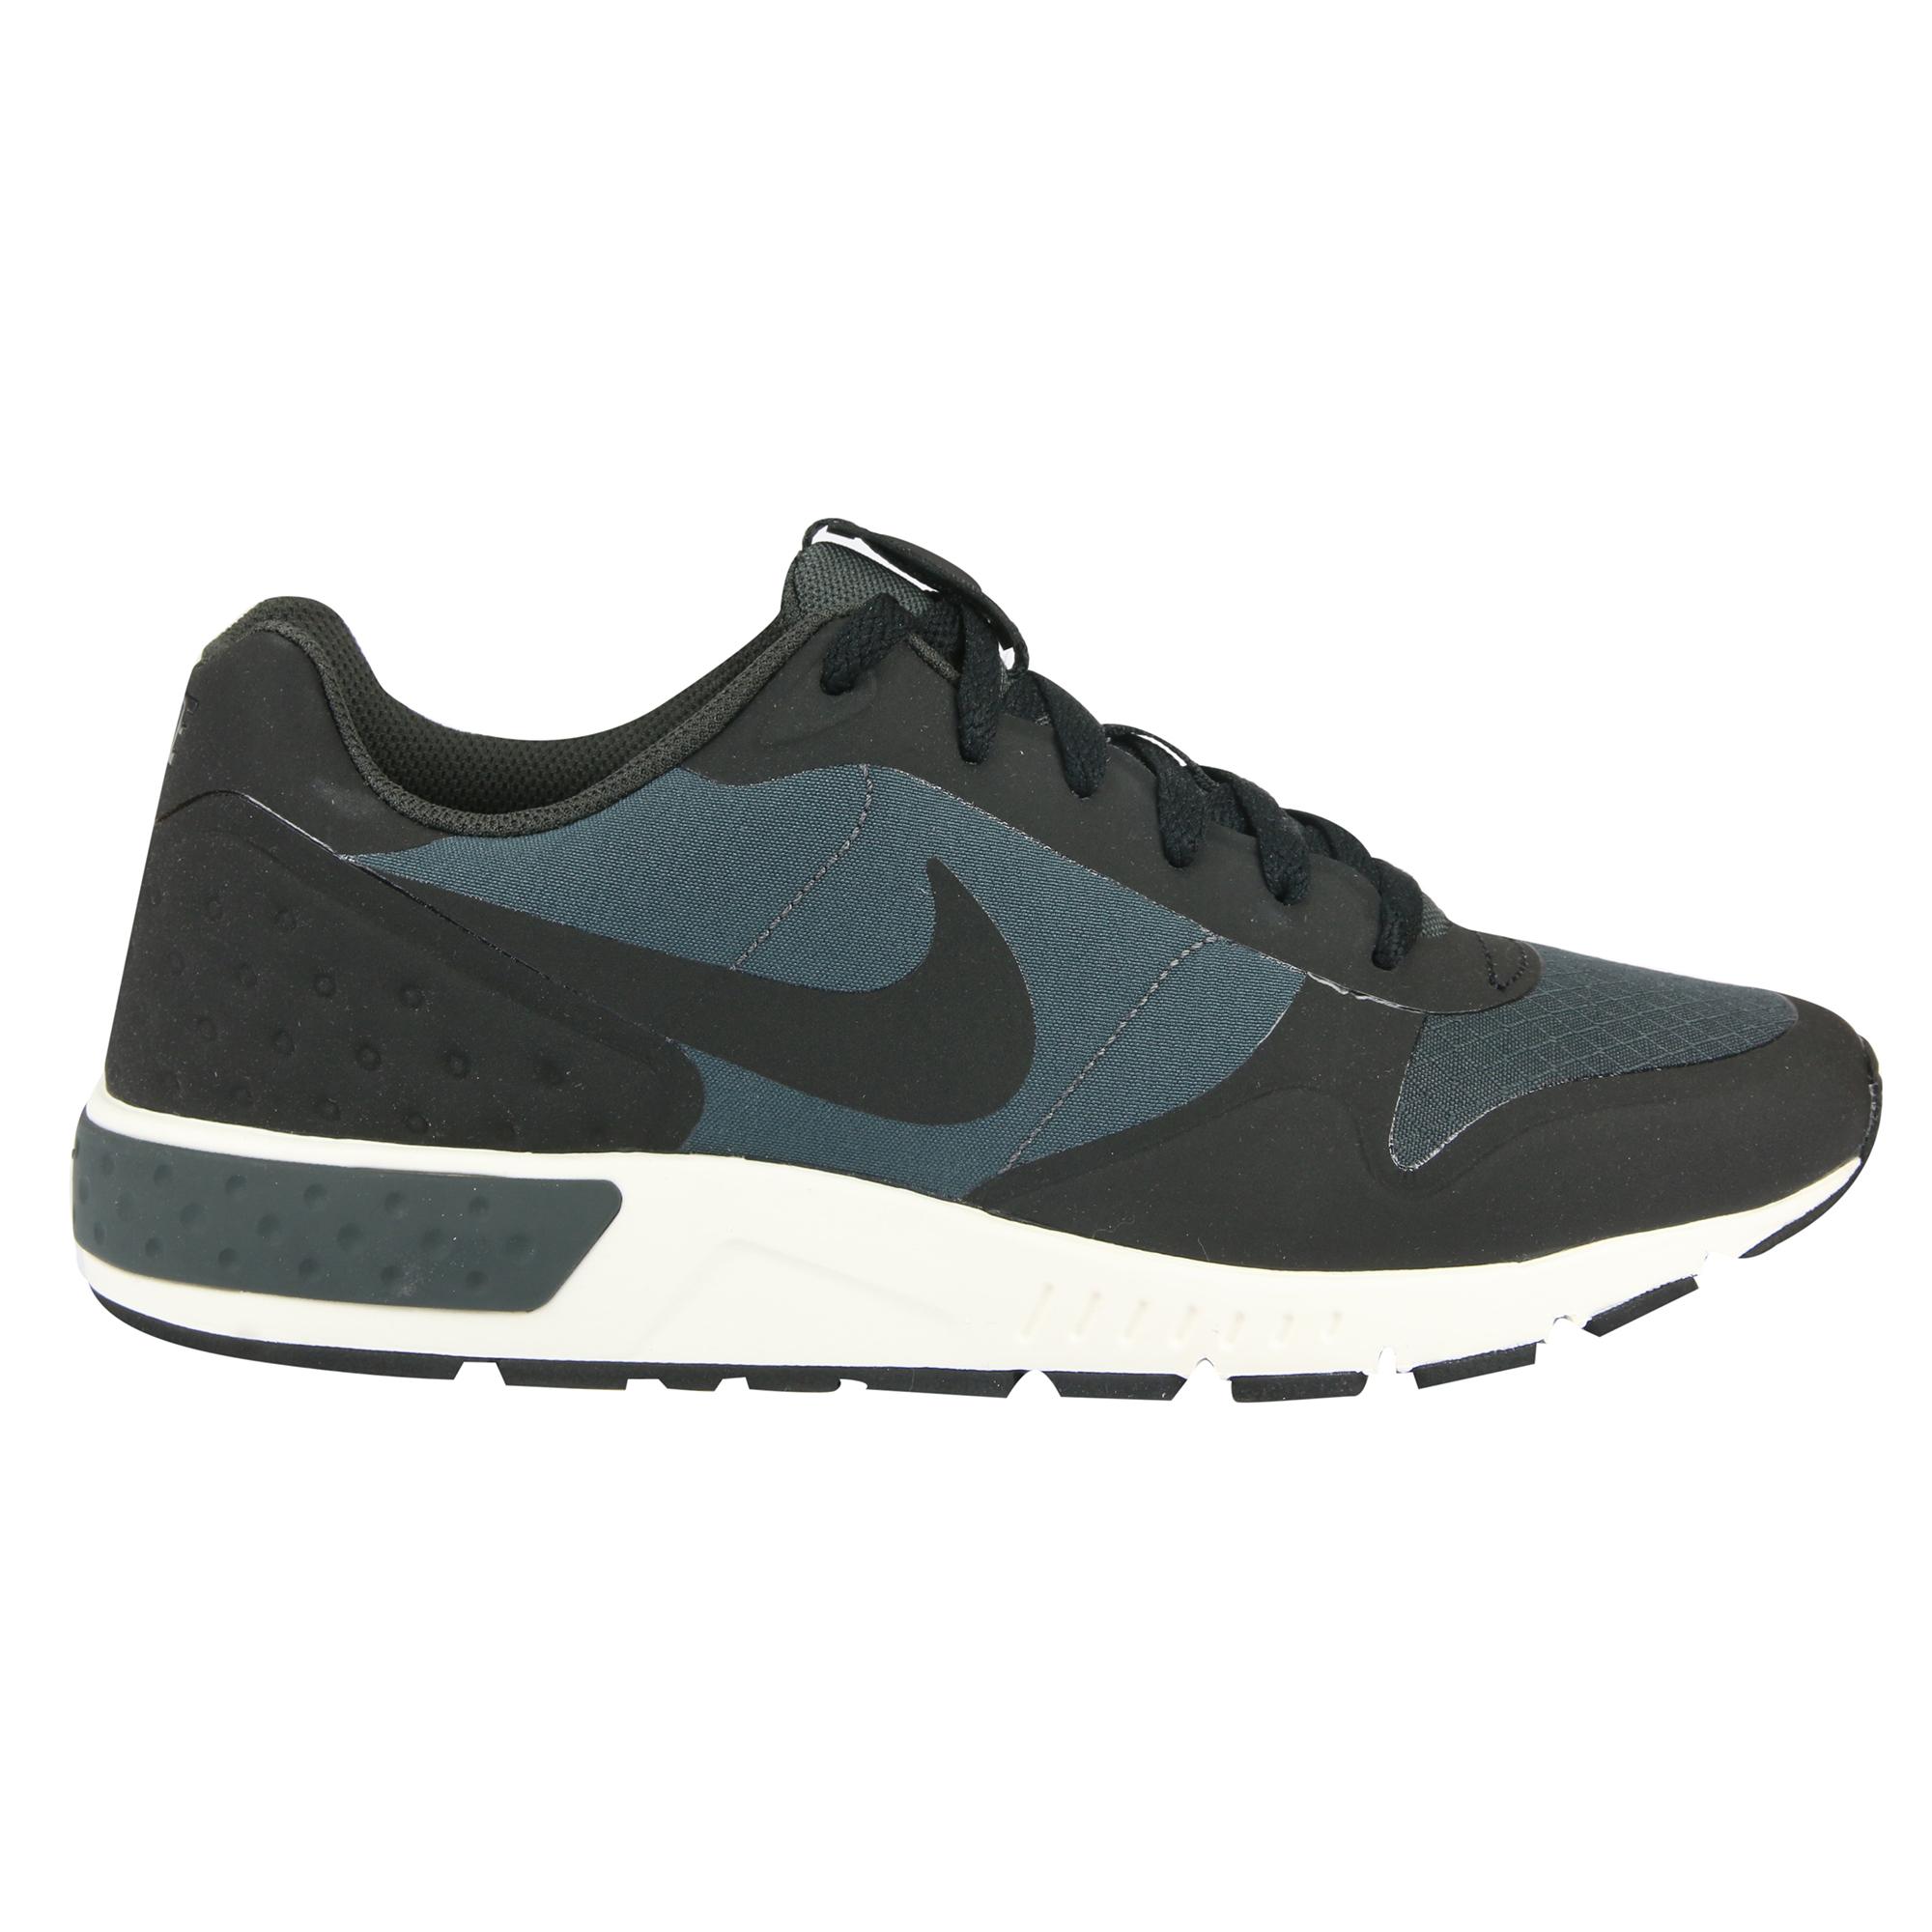 Nike Nightgazer LW SE Schuhe Turnschuhe Sneaker Herren 644402